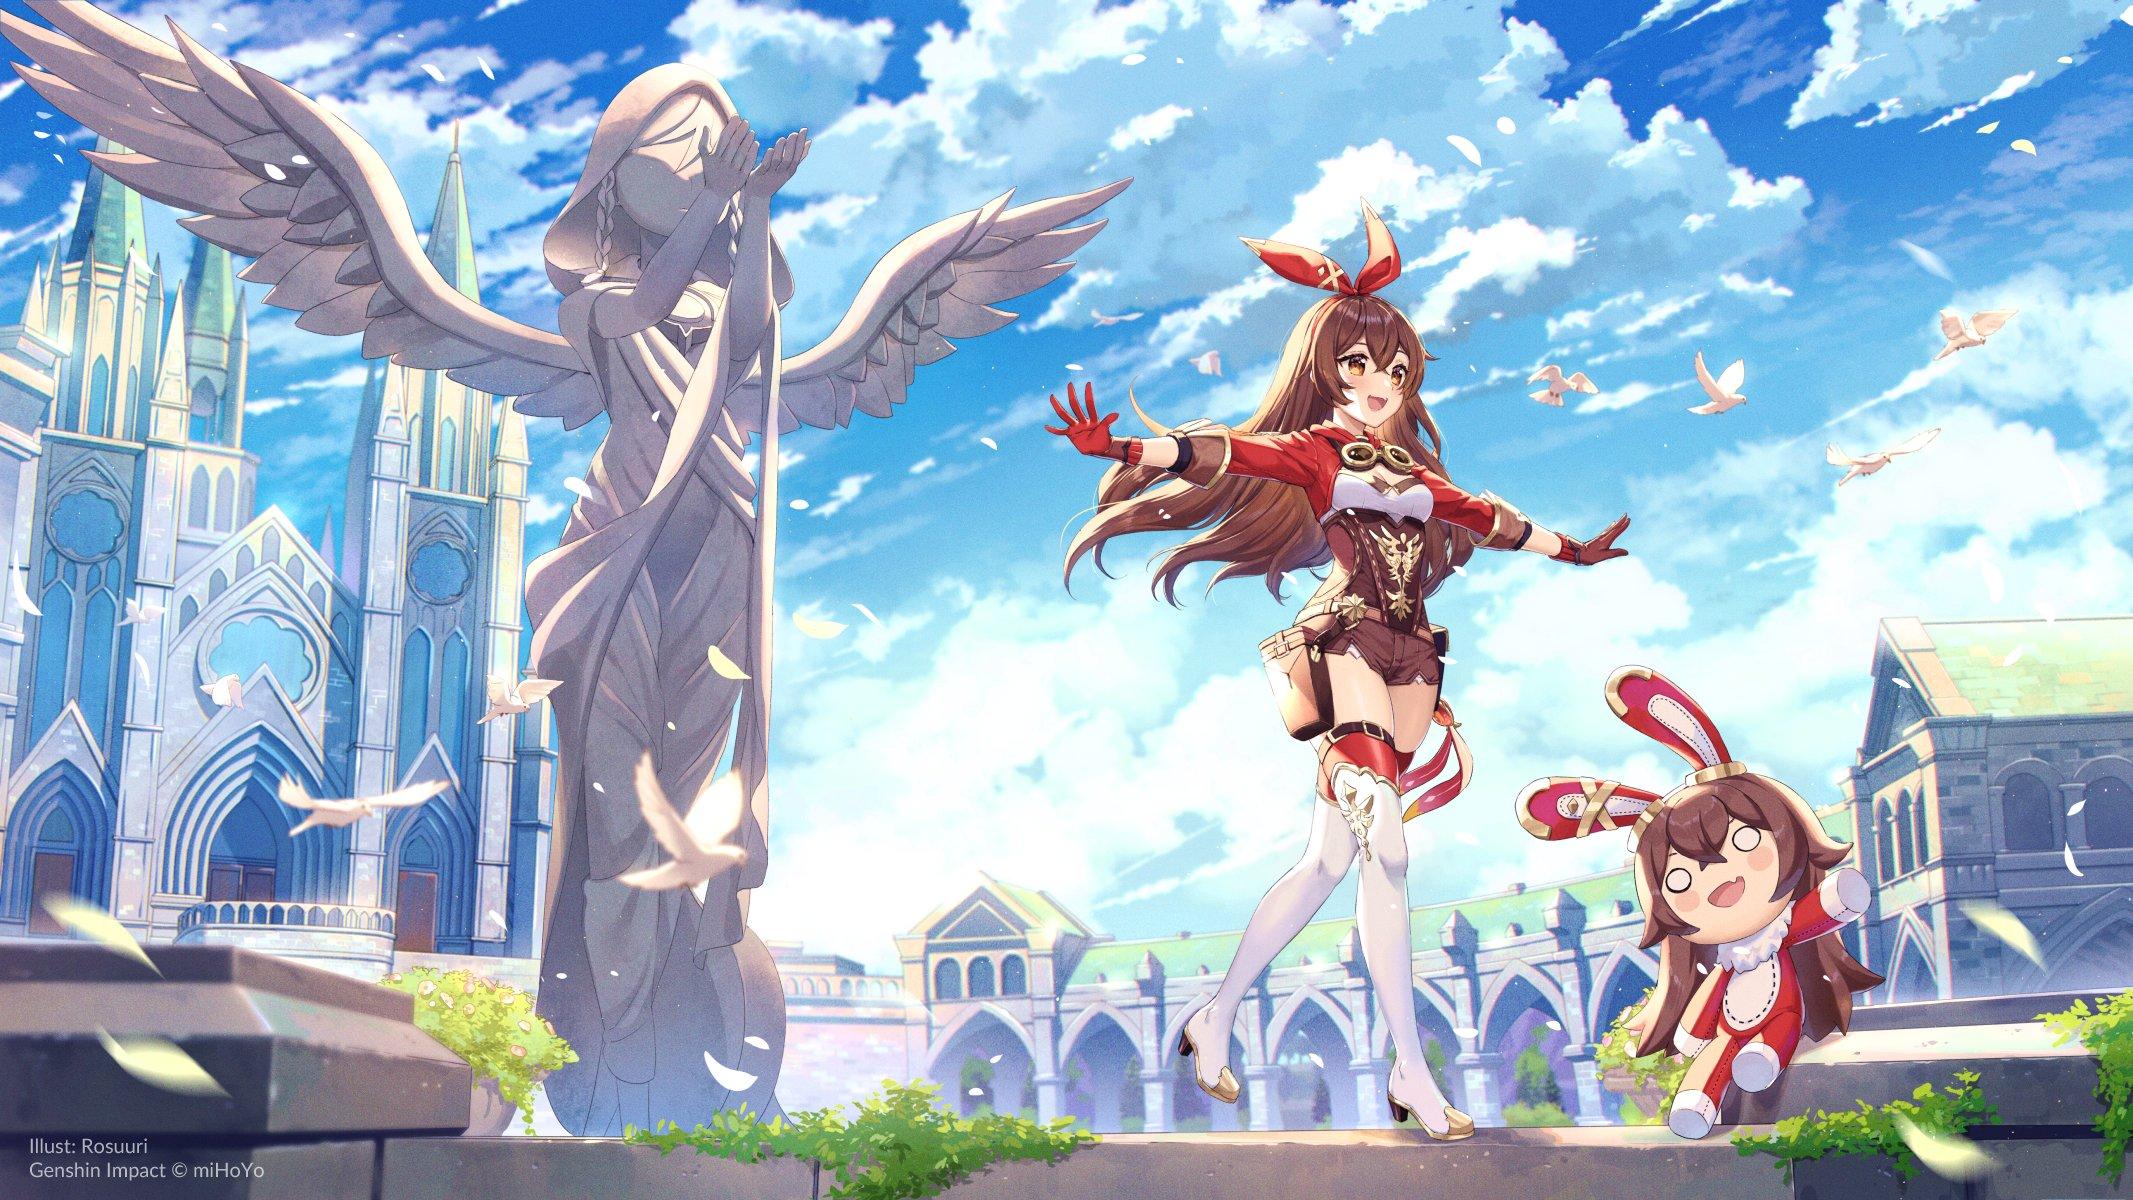 Anime 2133x1200 anime anime girls digital art artwork 2D portrait Genshin Impact Amber (Genshin Impact) fantasy city brunette statue brown eyes thigh-highs short shorts Rosuuri